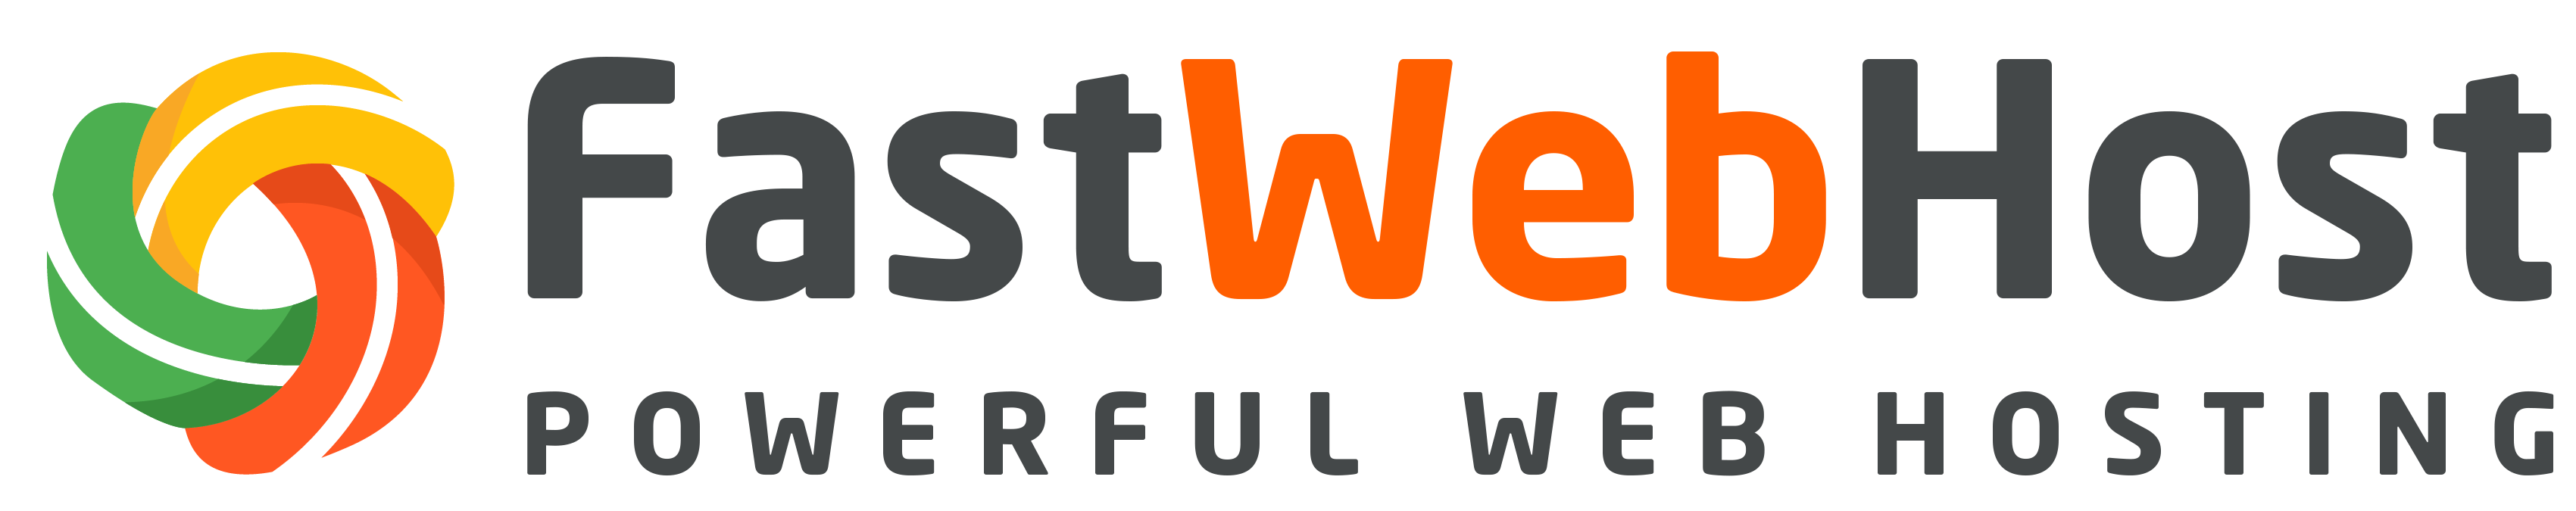 fastwebhost-logo-tagline